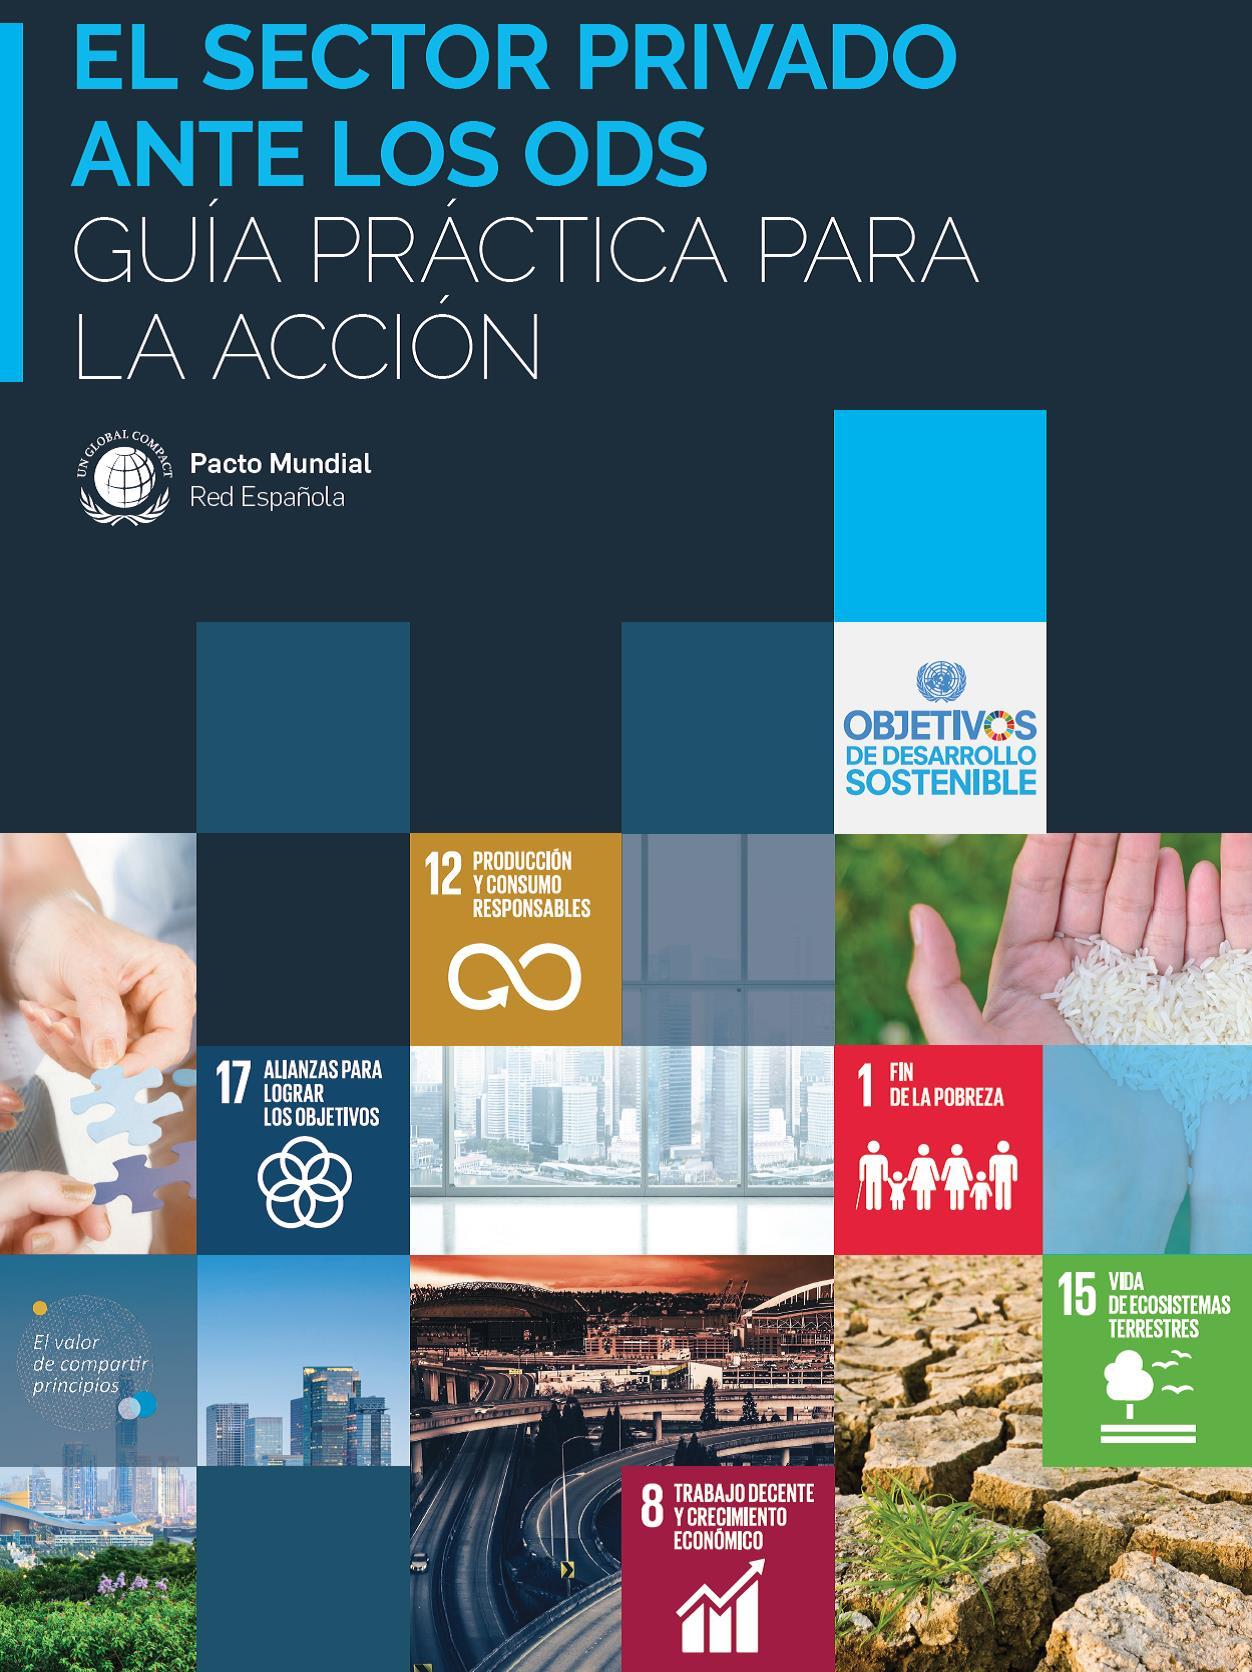 sector-privado-ods-pacto-mundial-guia-practica